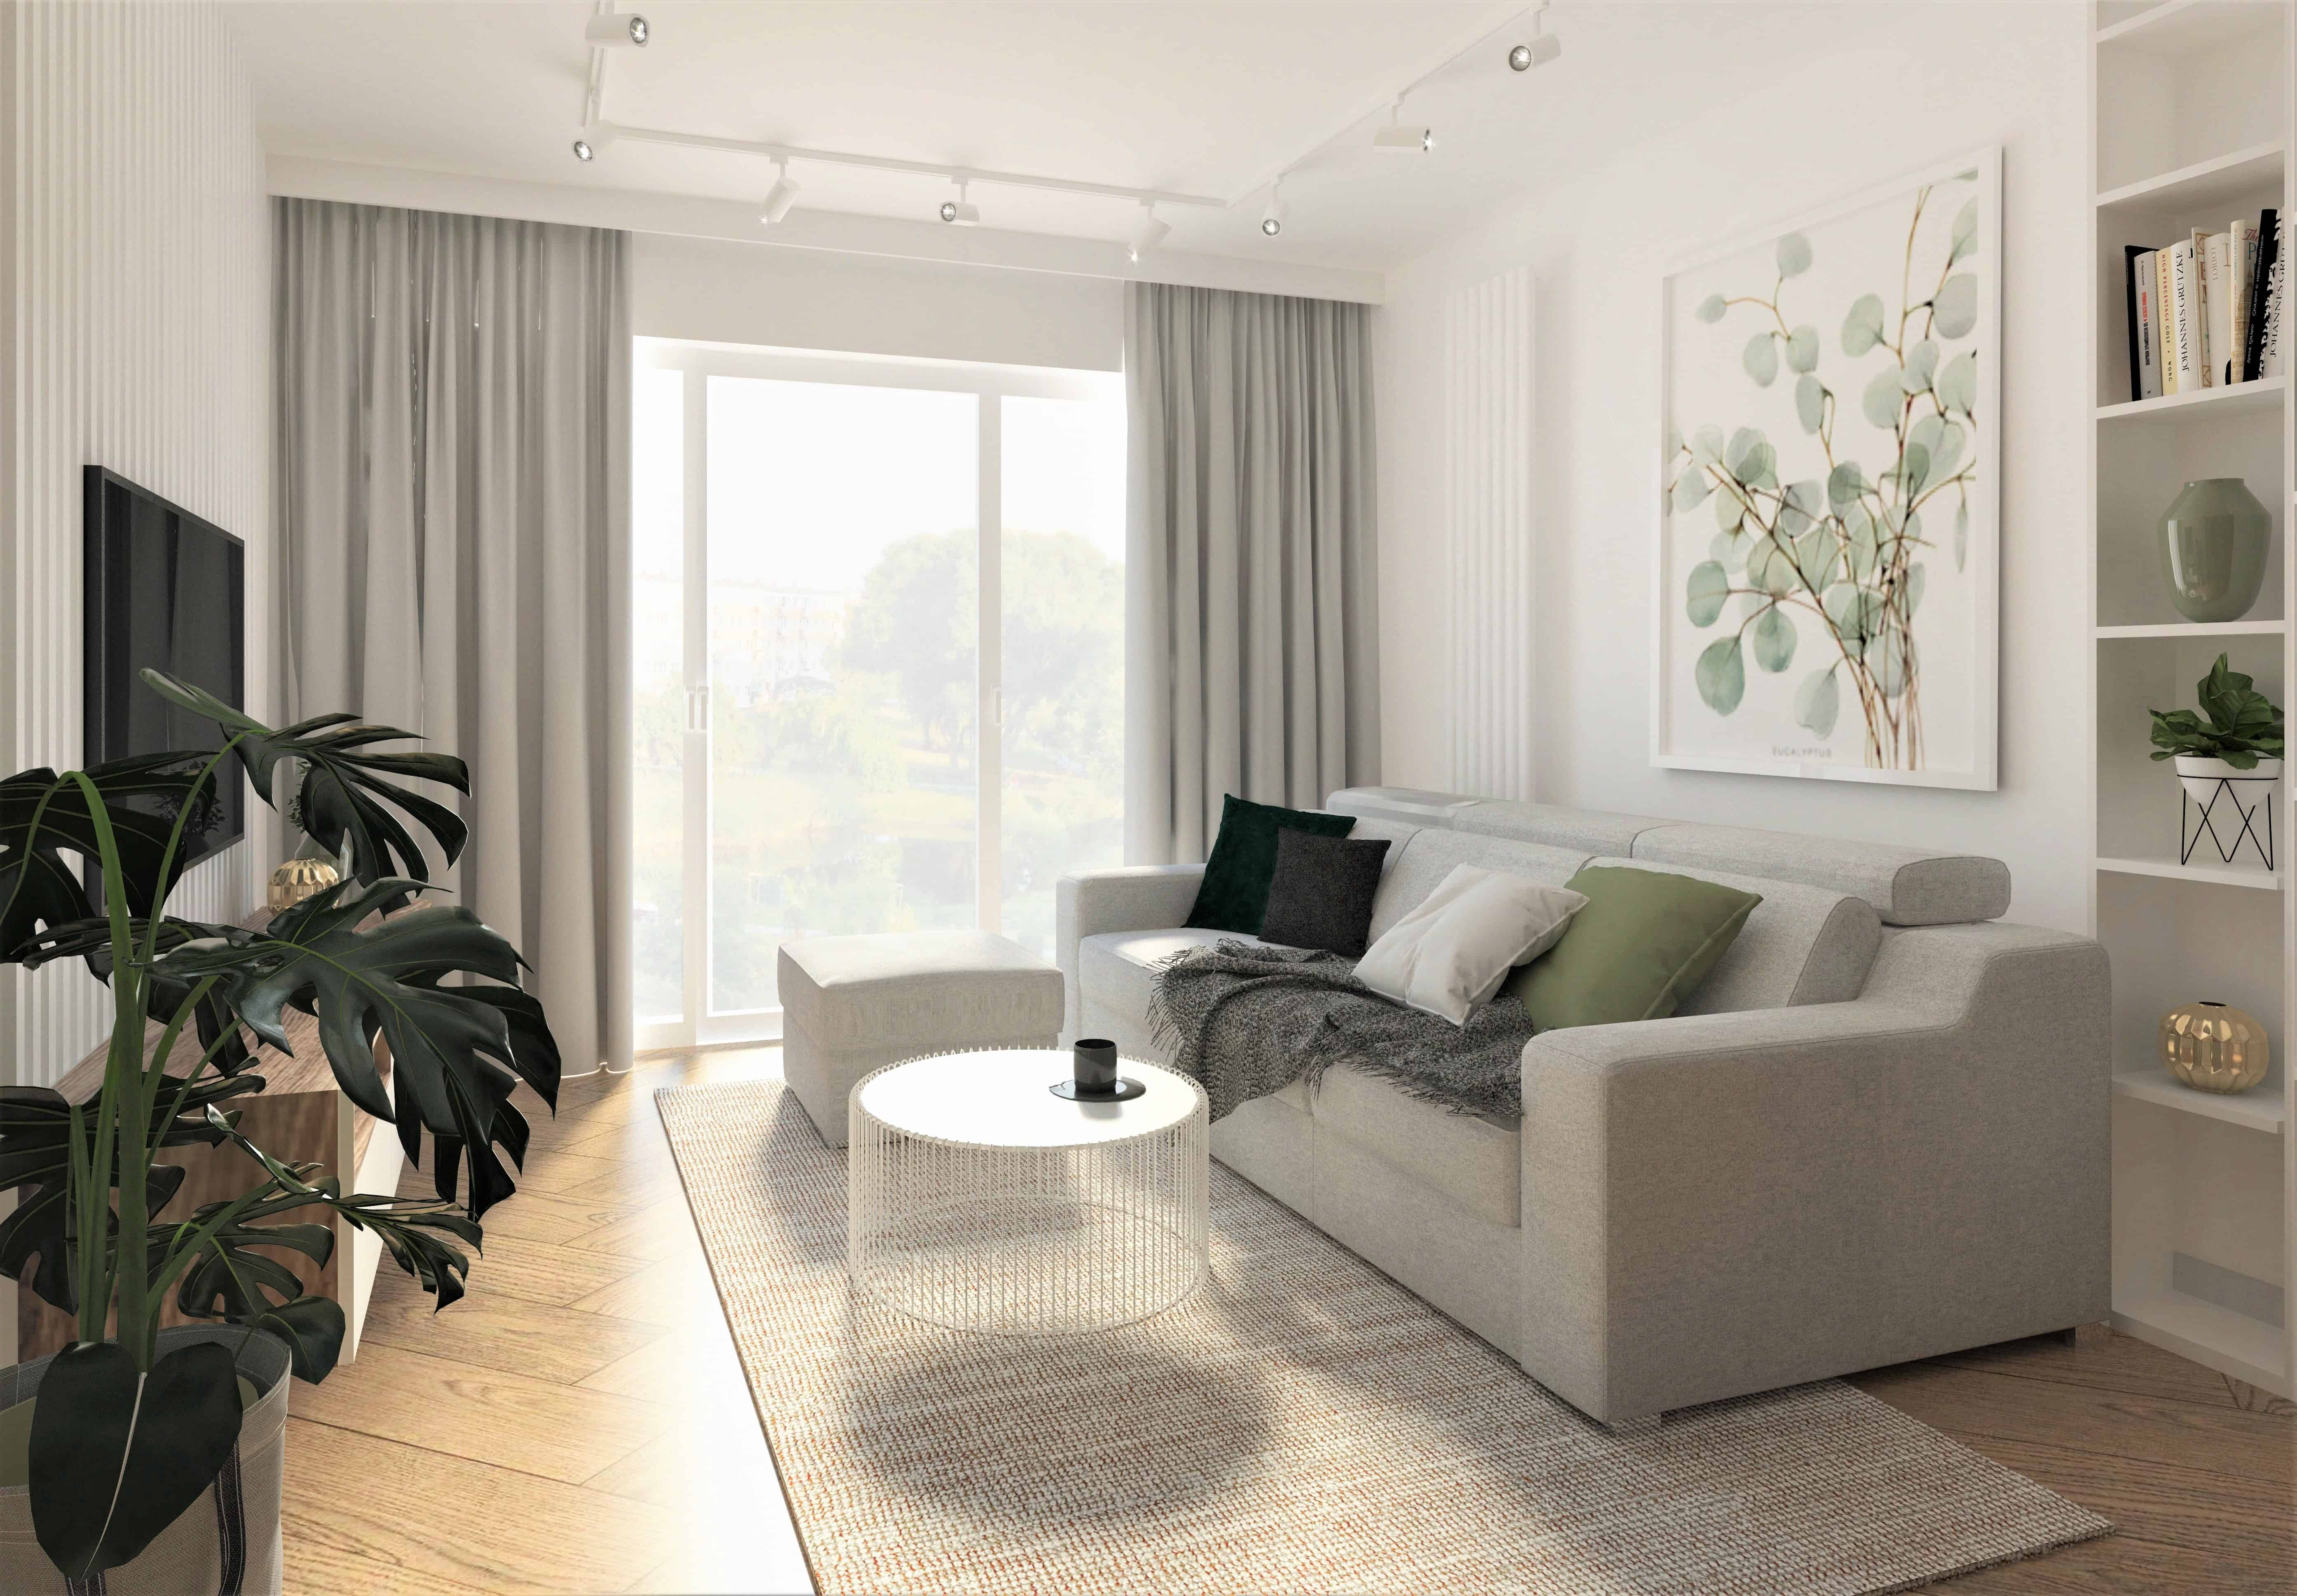 salon, mieszkanie od dewelopera, jak kupic mieszkanie od dewelopera